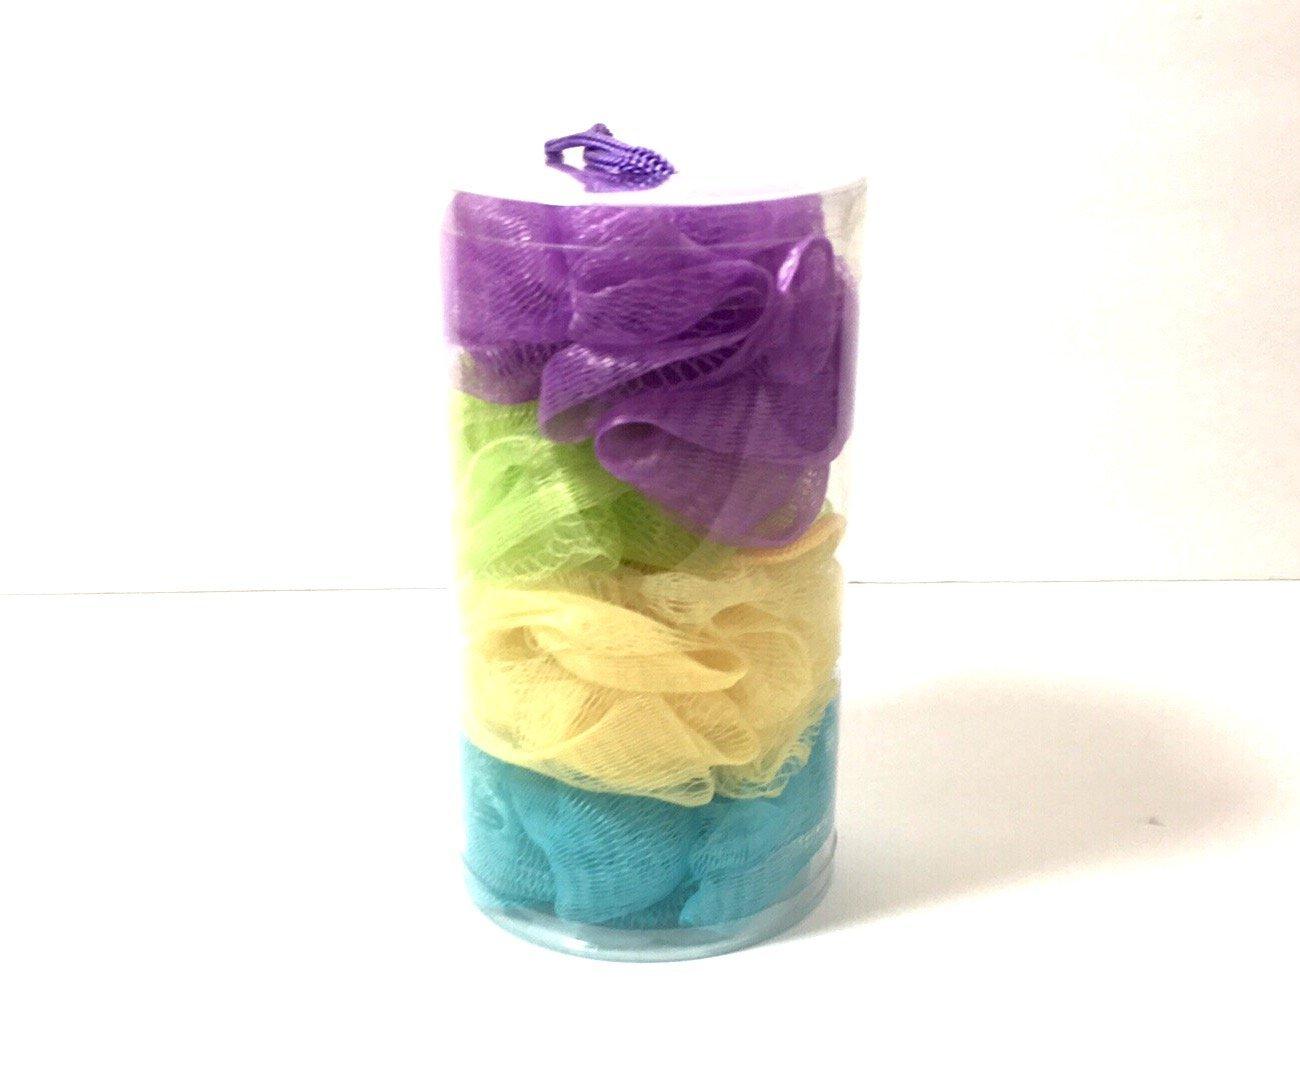 April Bath And Shower april bath shower sponge set: 1 listing